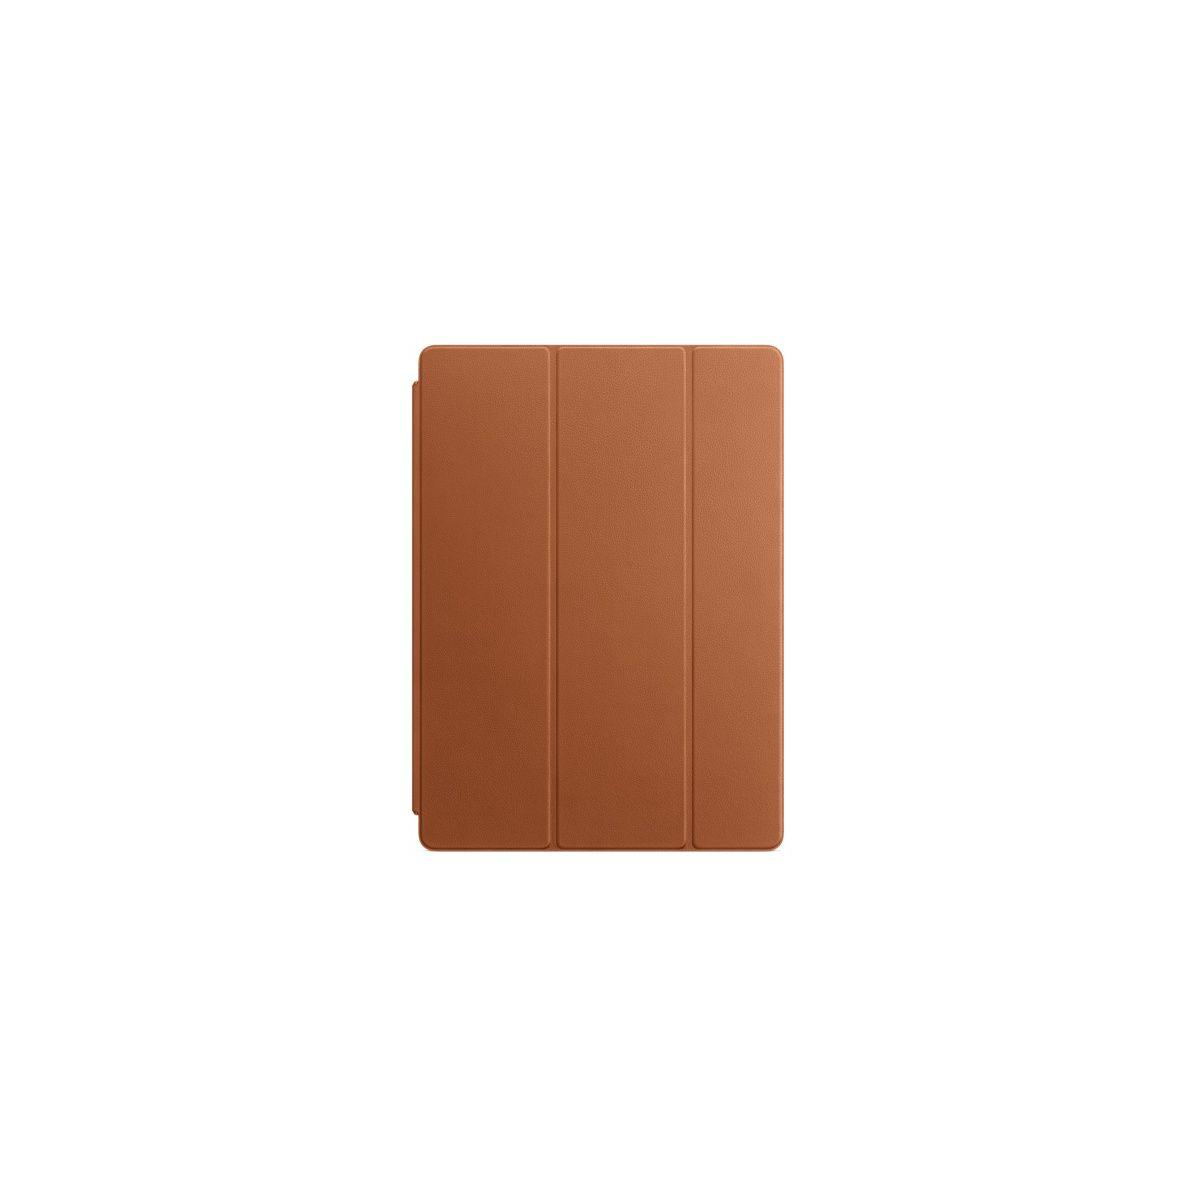 Etui tablette apple smart cover ipad pro 12.9 cuir havane - livraison offerte : code livrelais (photo)